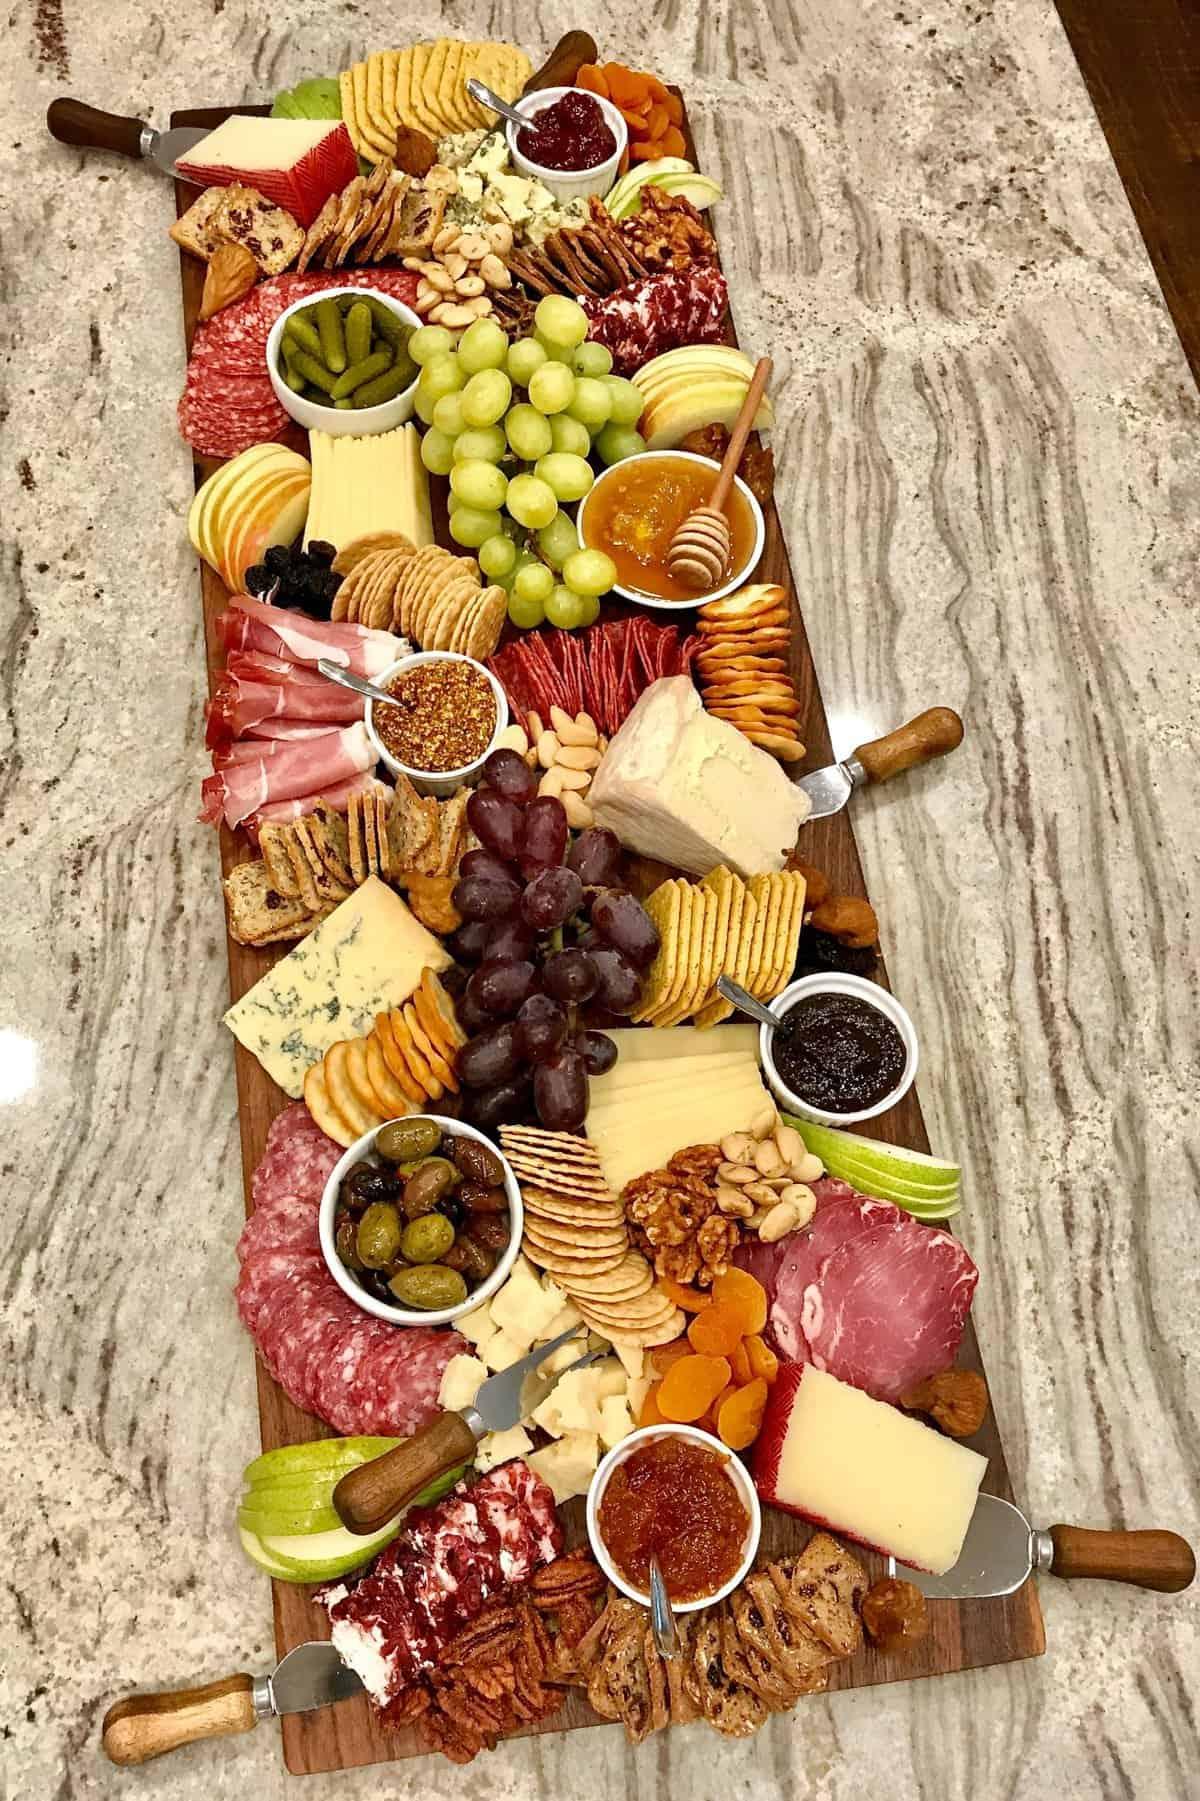 Trader Joe S Cheese And Charcuterie Board The Bakermama